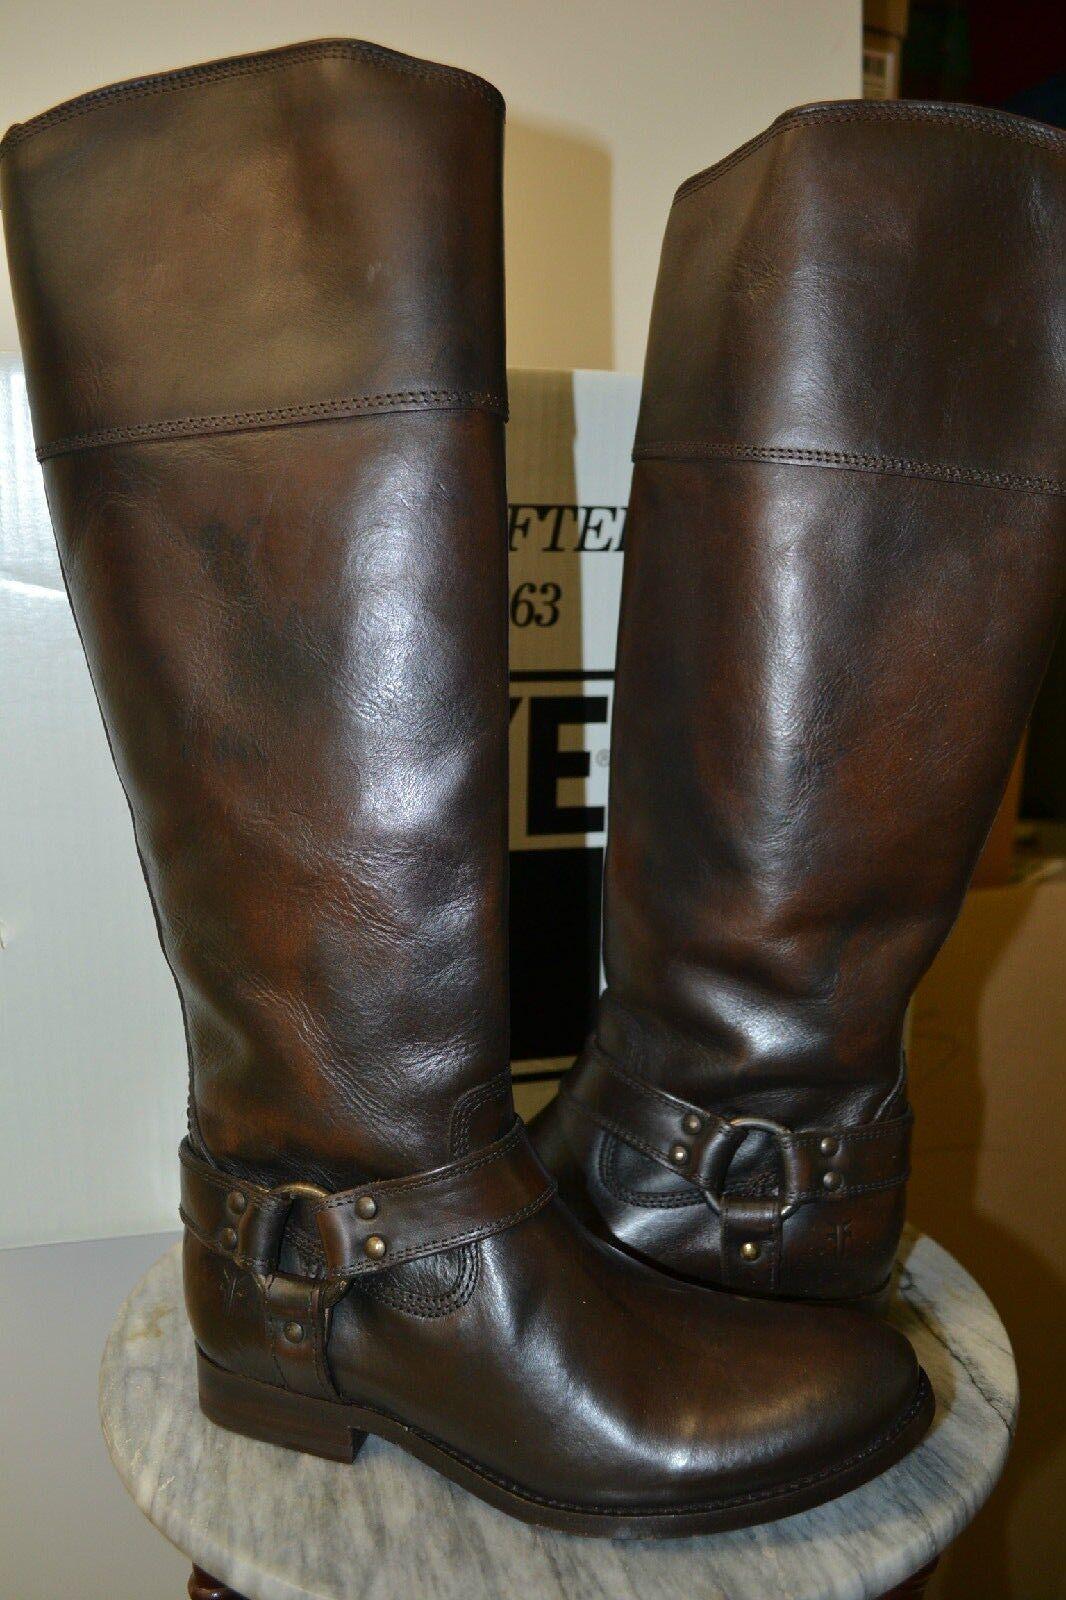 NIB Frye MELISSA Harness Inside Zip Extended Calf Riding Boots - Size 6